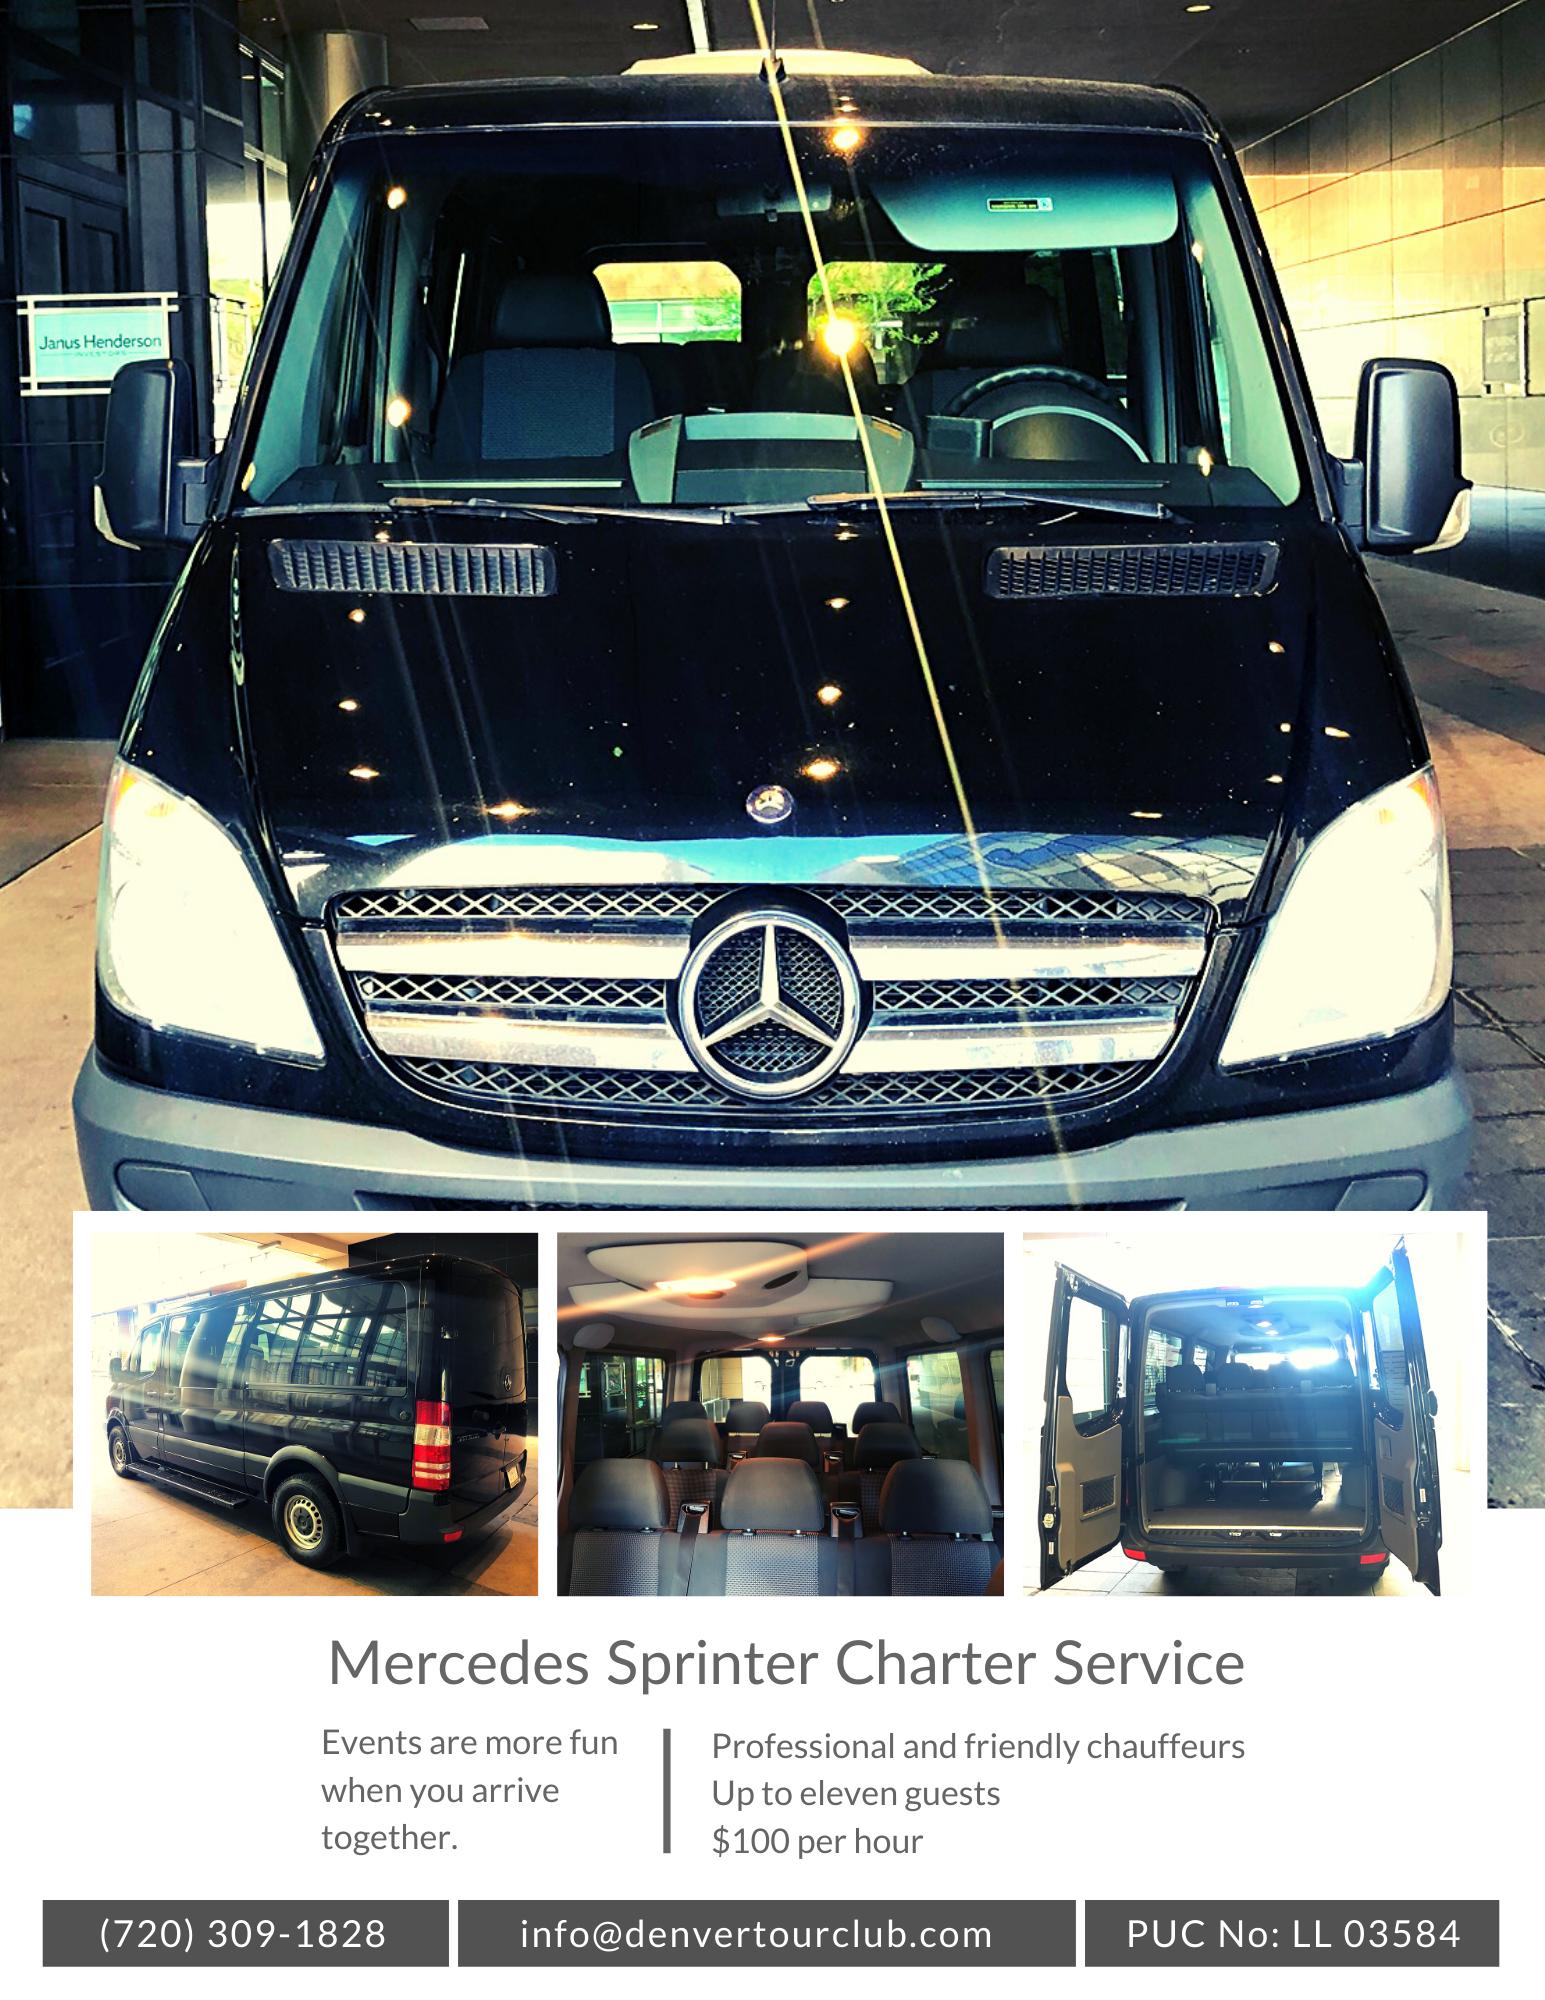 mercedes-sprinter-charter-service-denver-tour-club-2-.png